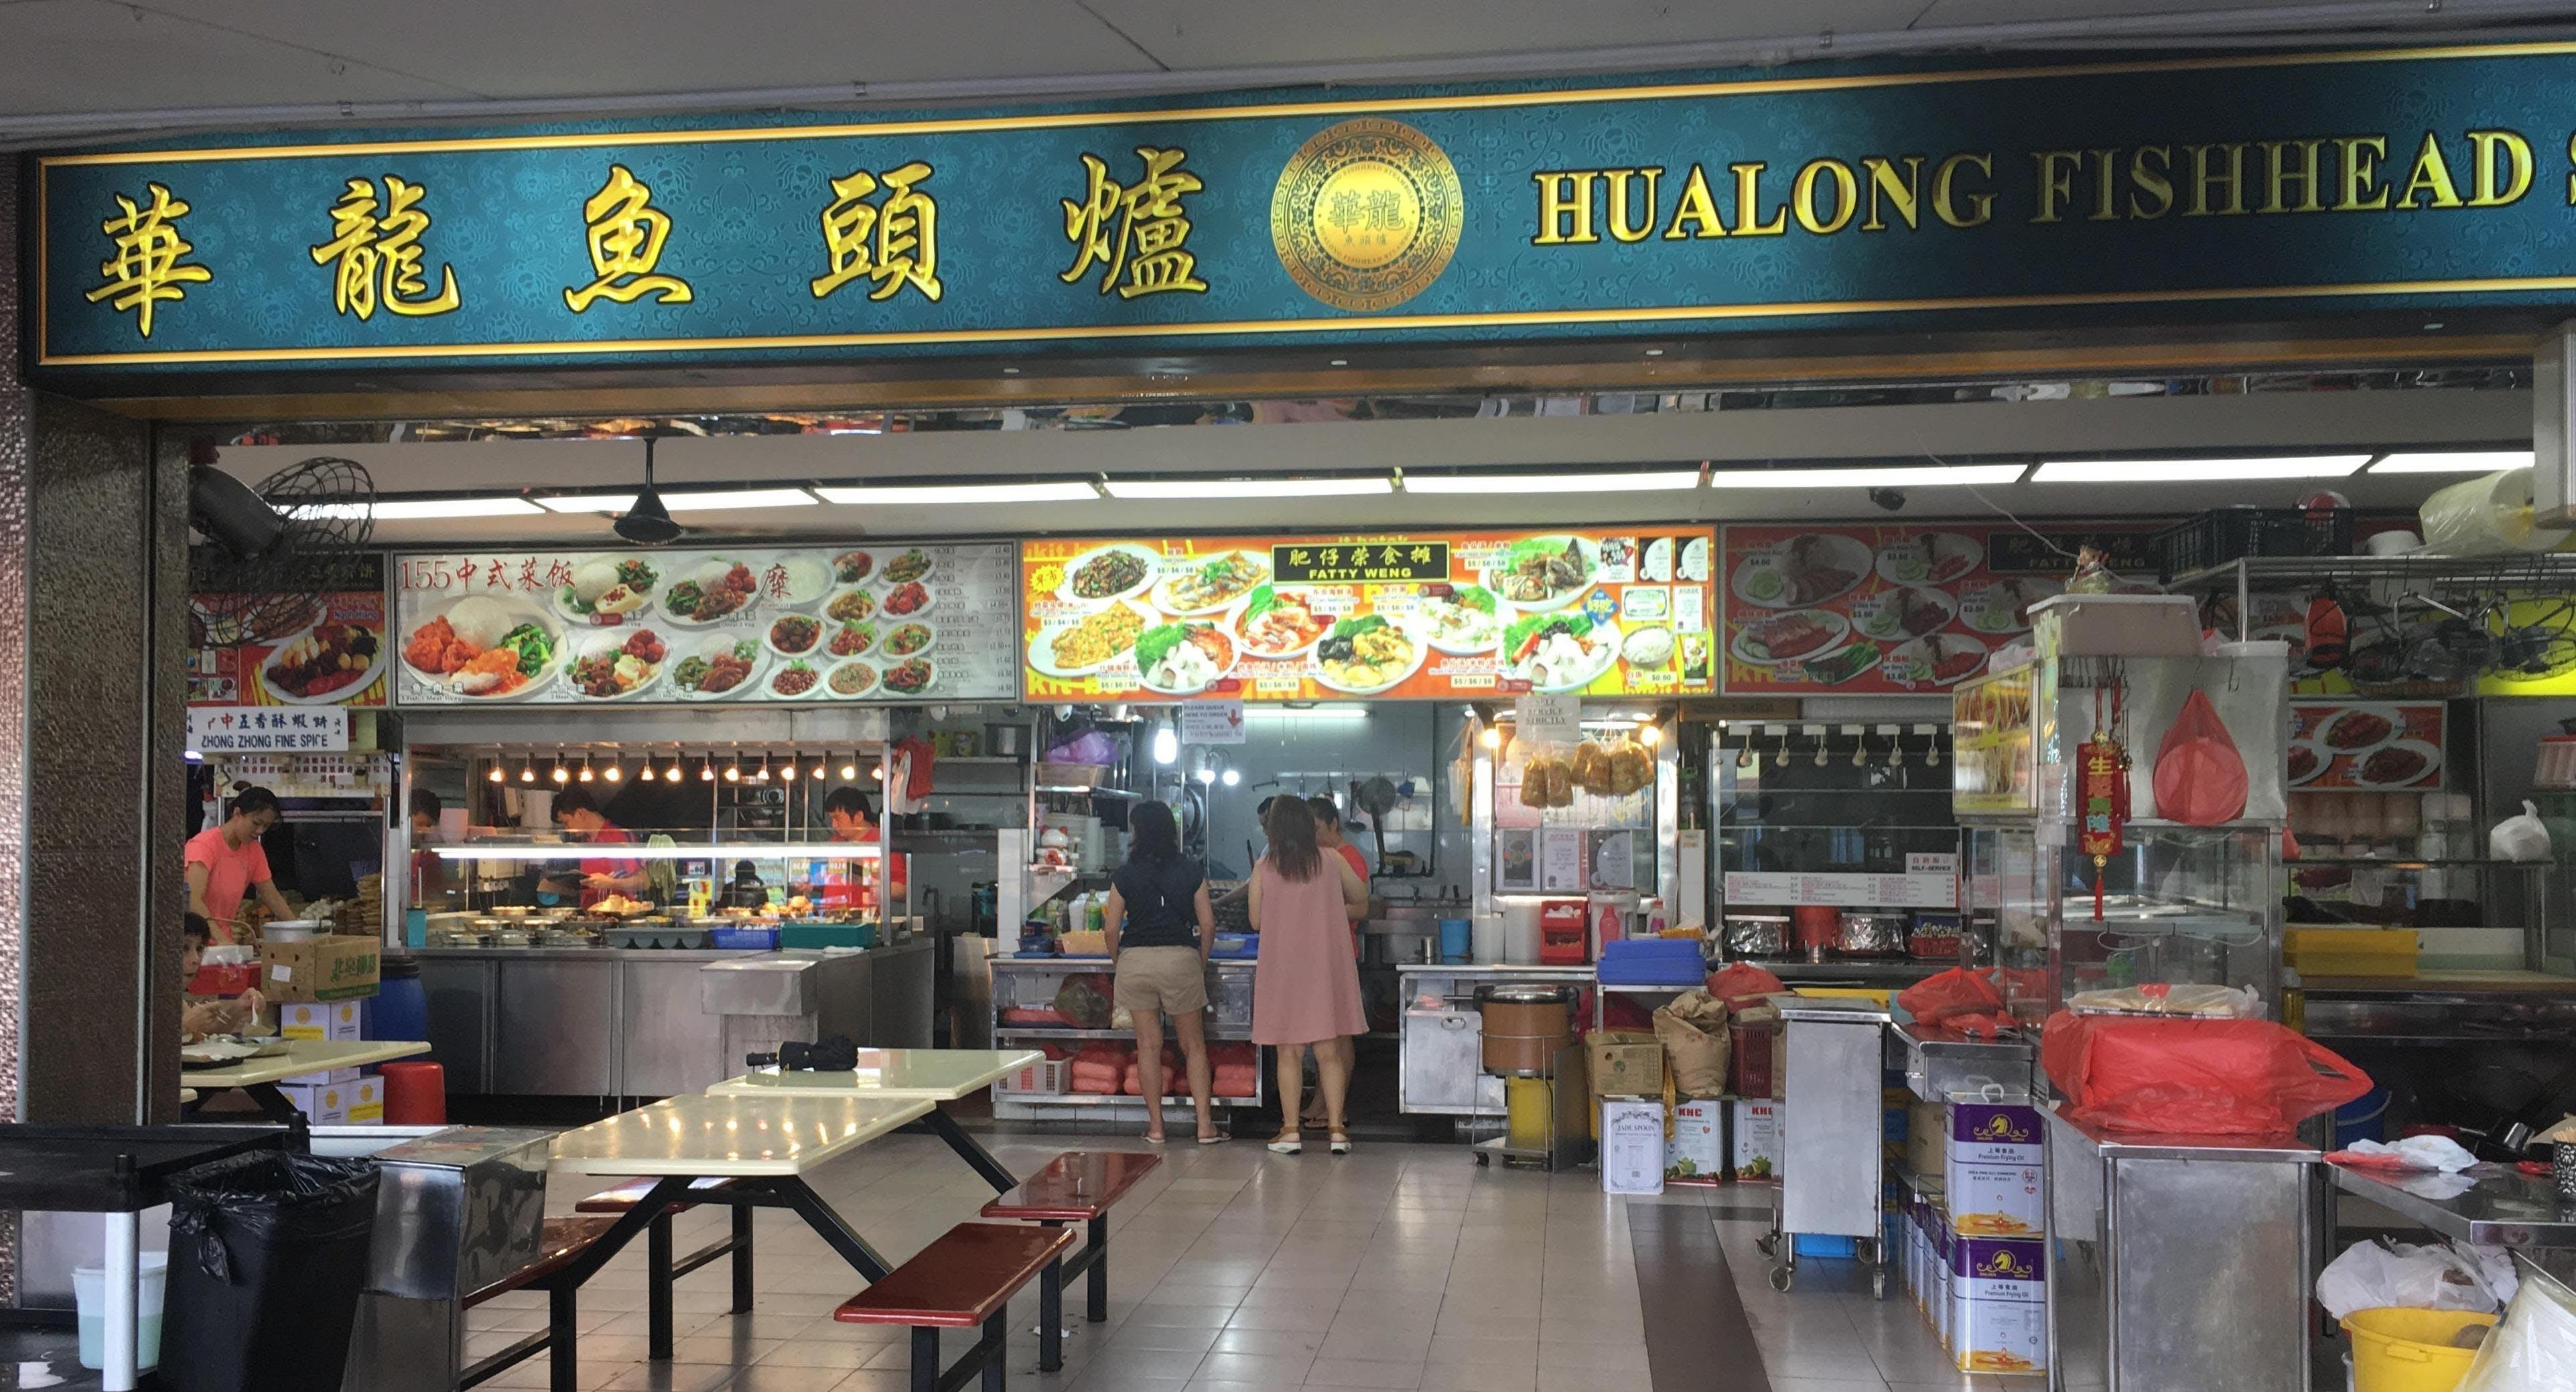 Hualong Fishhead Steamboat - Ang Mo Kio Singapore image 2